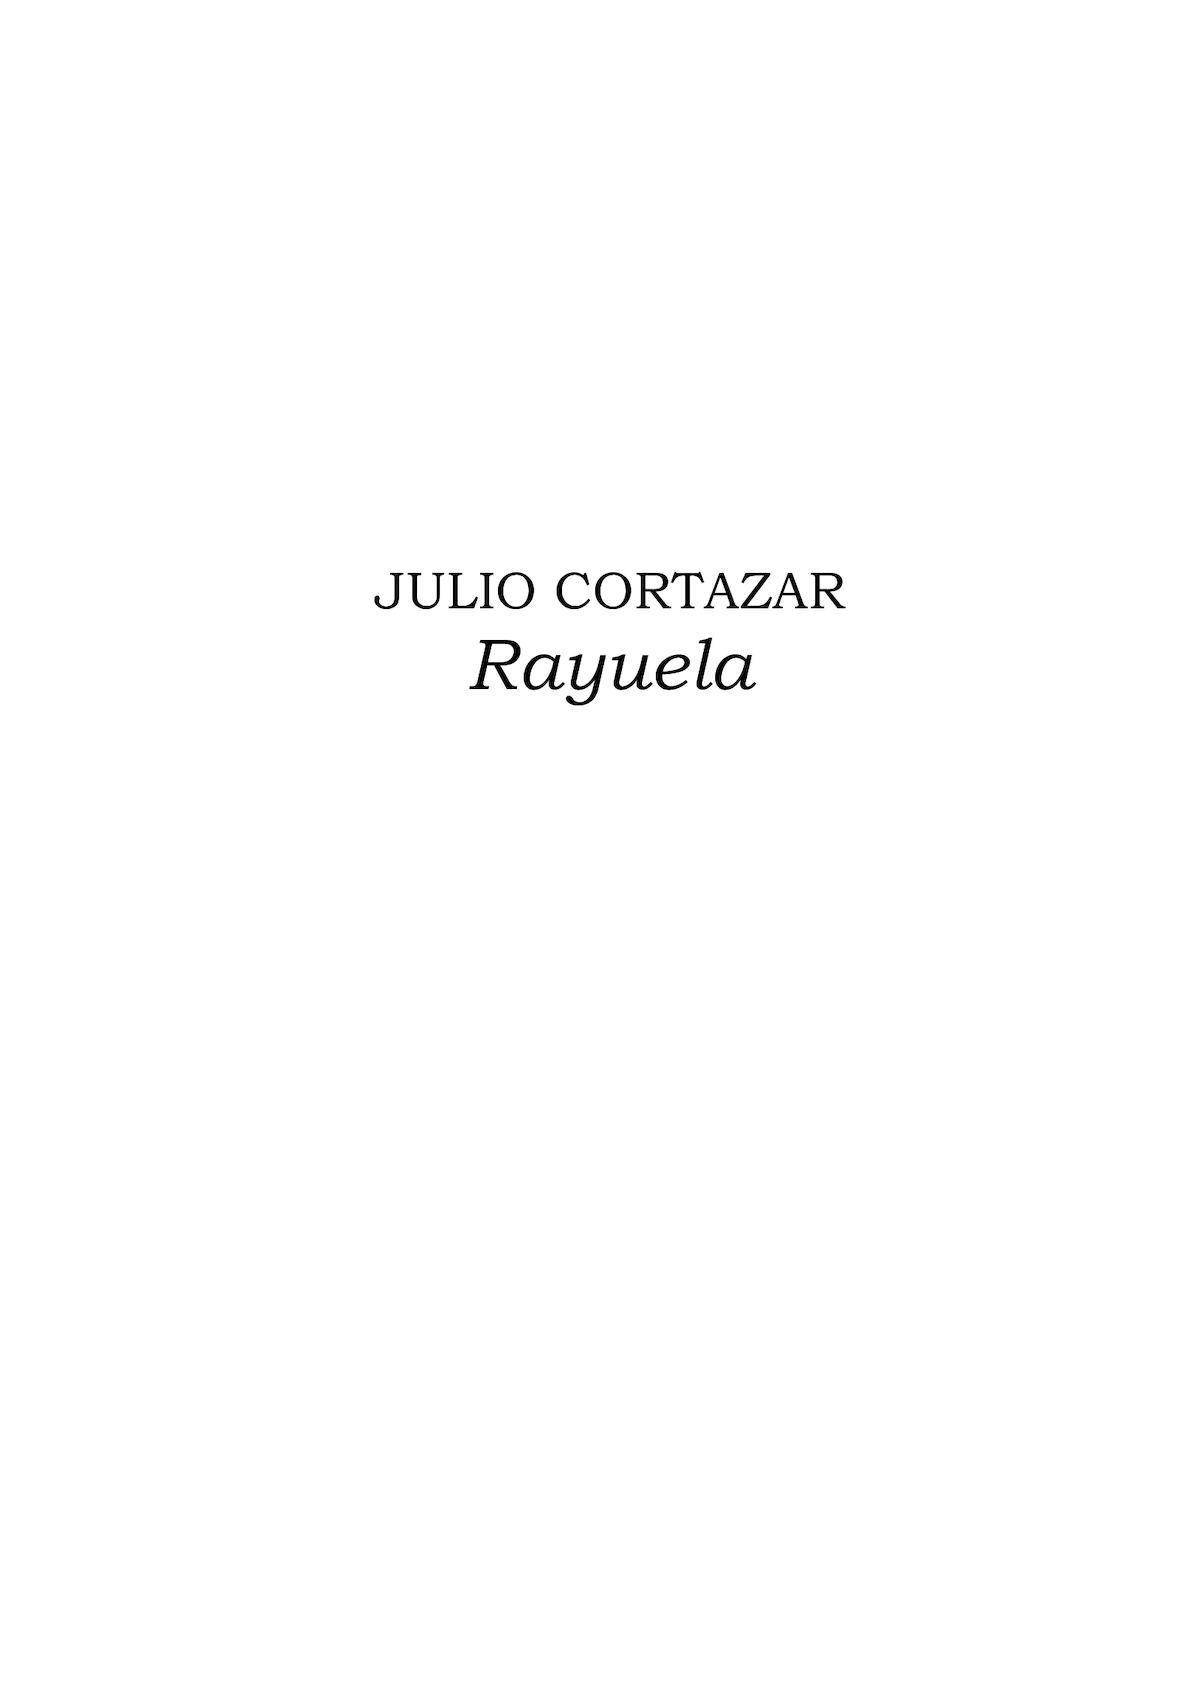 Calaméo - Rayuela Cortazar Julio